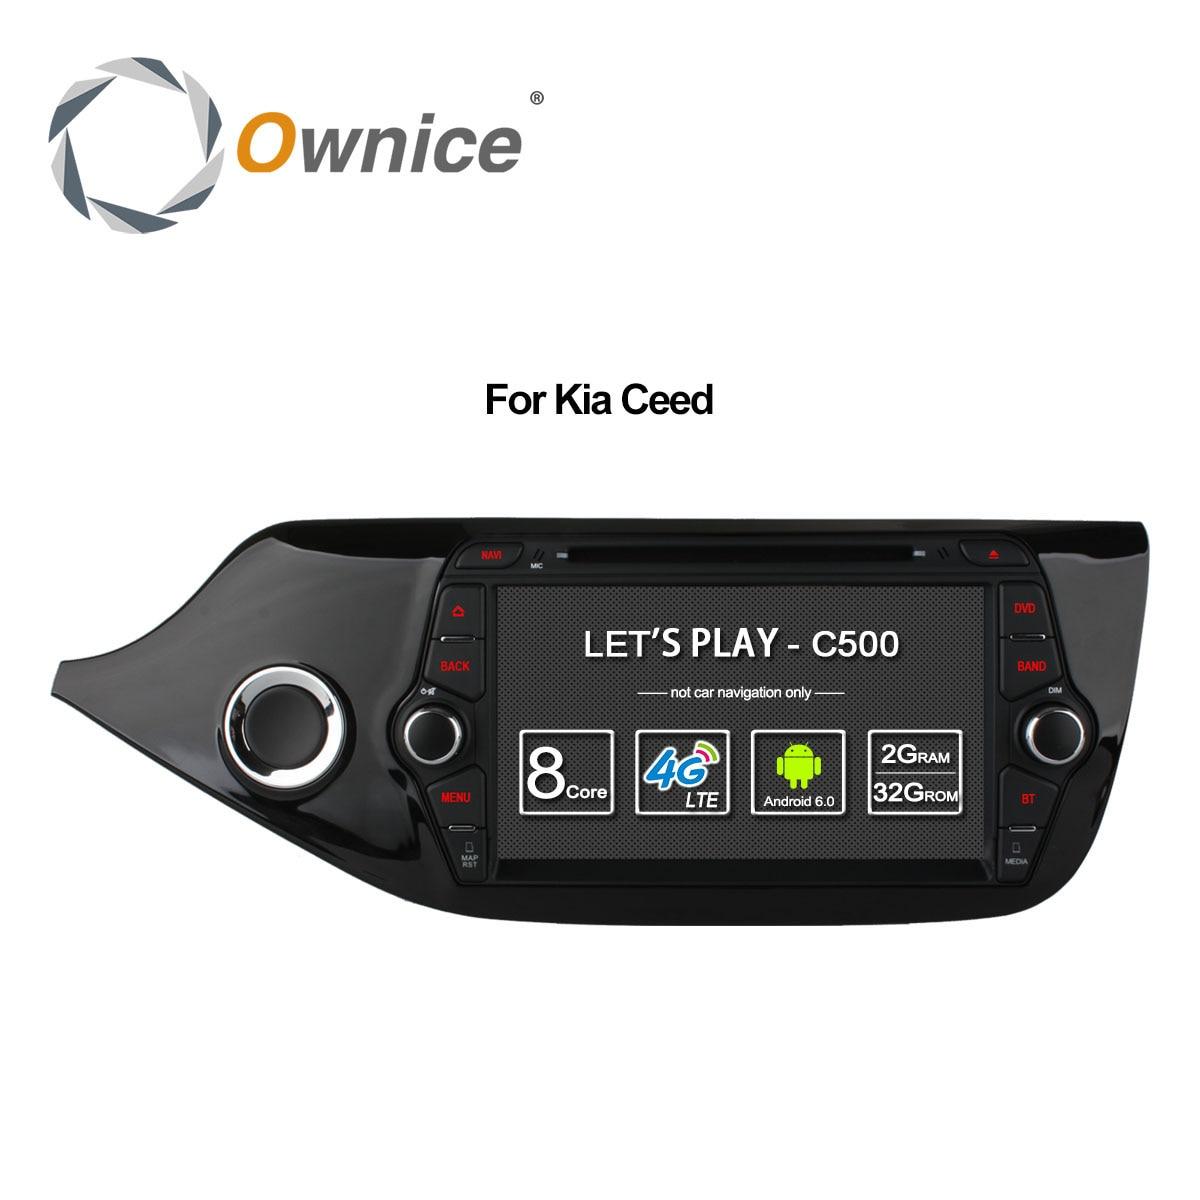 Ownice C500 4G SIM LTE Octa 8 Core  Android 6.0 For Kia CEED 2013-2015 Car DVD Player GPS Navi Radio WIFI 4G BT 2GB RAM 32G ROM ownice c500 ol 7001f 7 0 inch car navigator dvd player